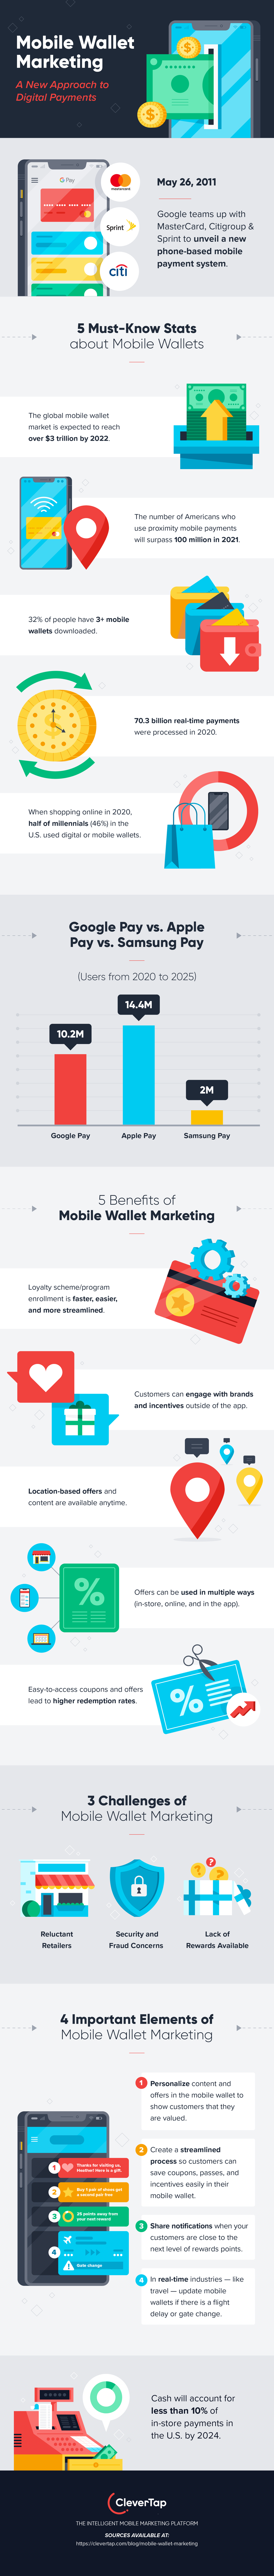 mobile-wallet-marketing